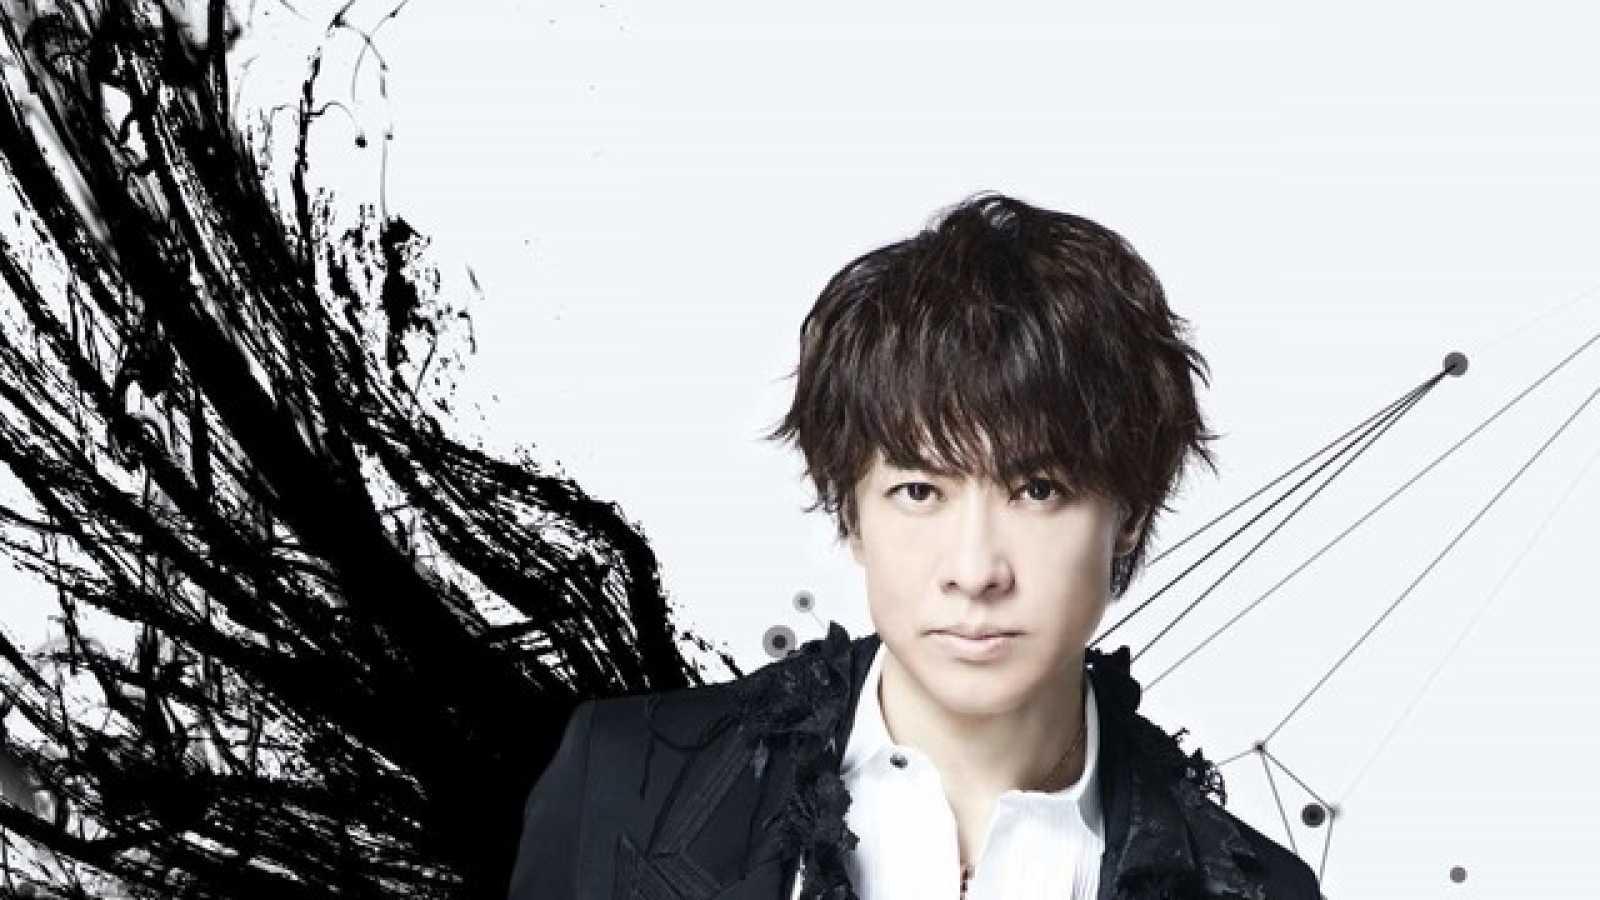 Soolominialbumi Hiroyuki Takamilta © GUAN BARL Co.,LTD.